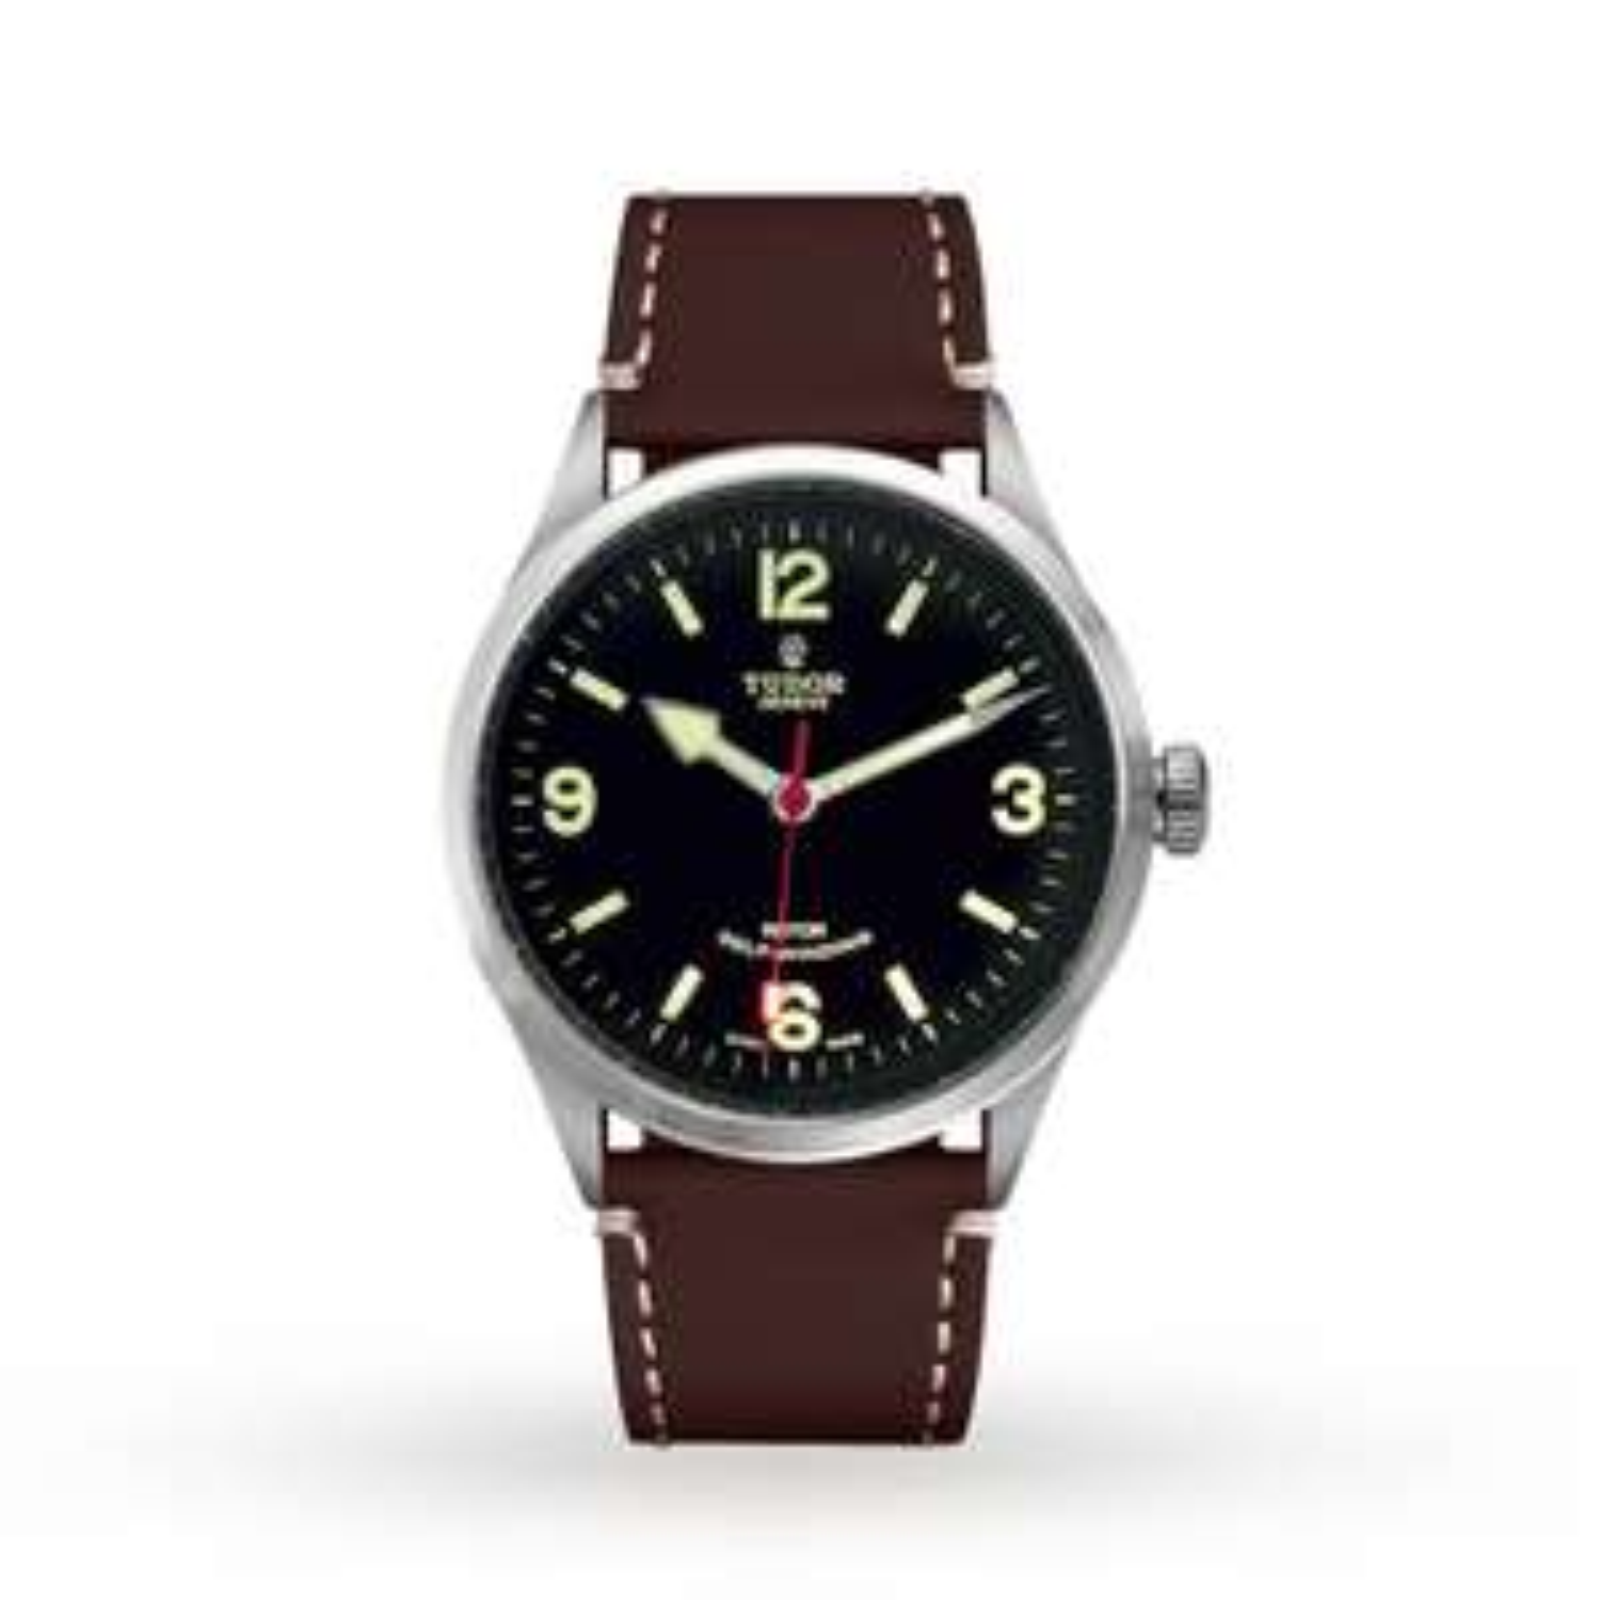 Tudor heritage ranger Men's watch M79910-0013 - £1,510 @ Goldsmiths